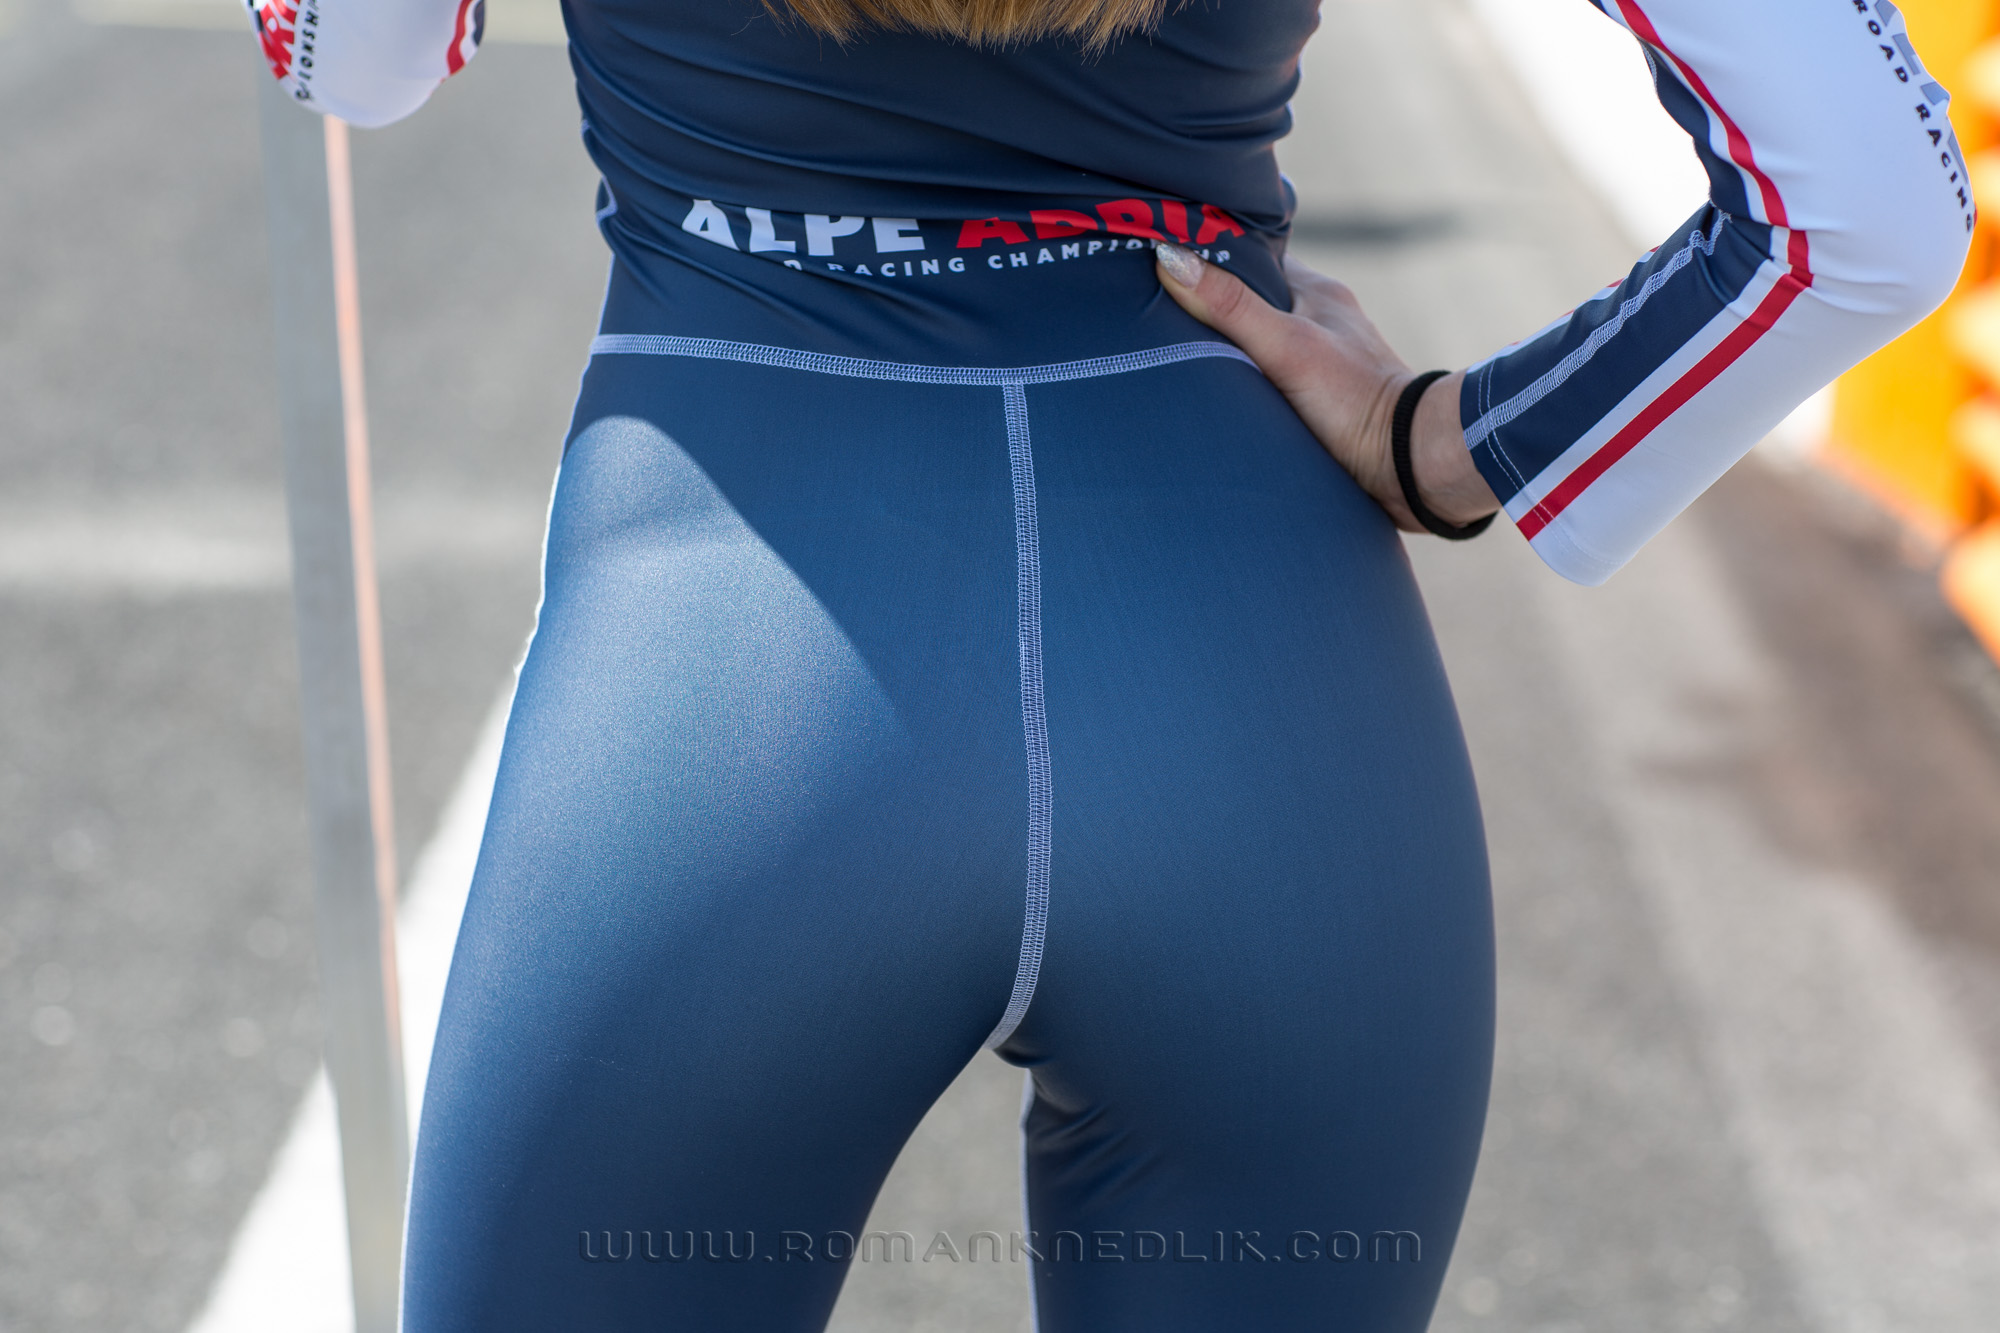 Alpe_Adria_European_Championship-28